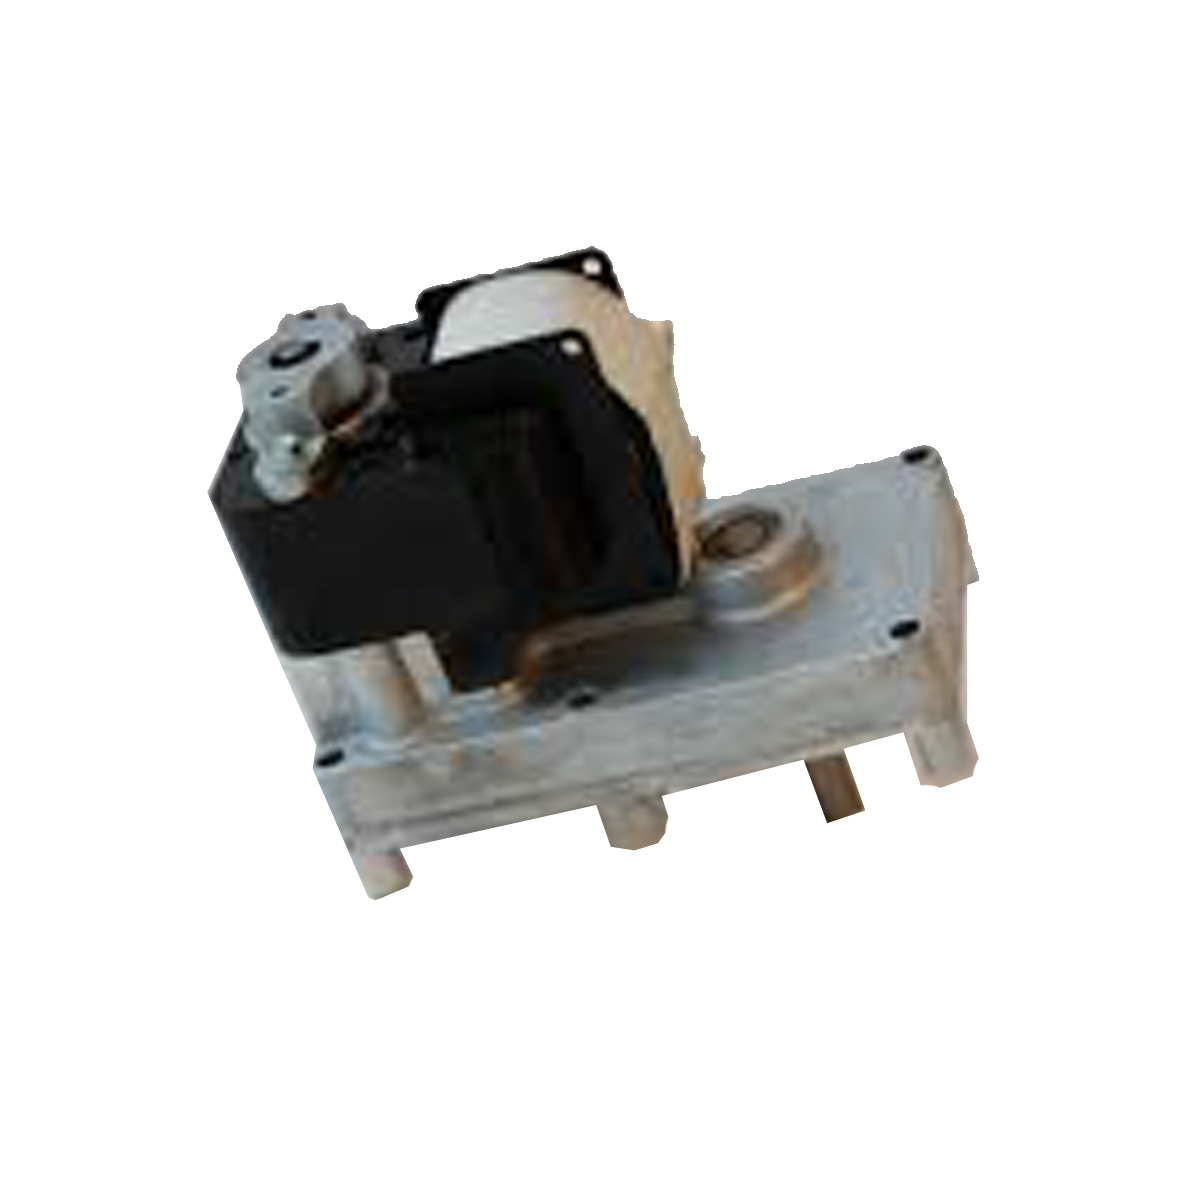 Pelletmotor 2 RPM voor pelletkachel